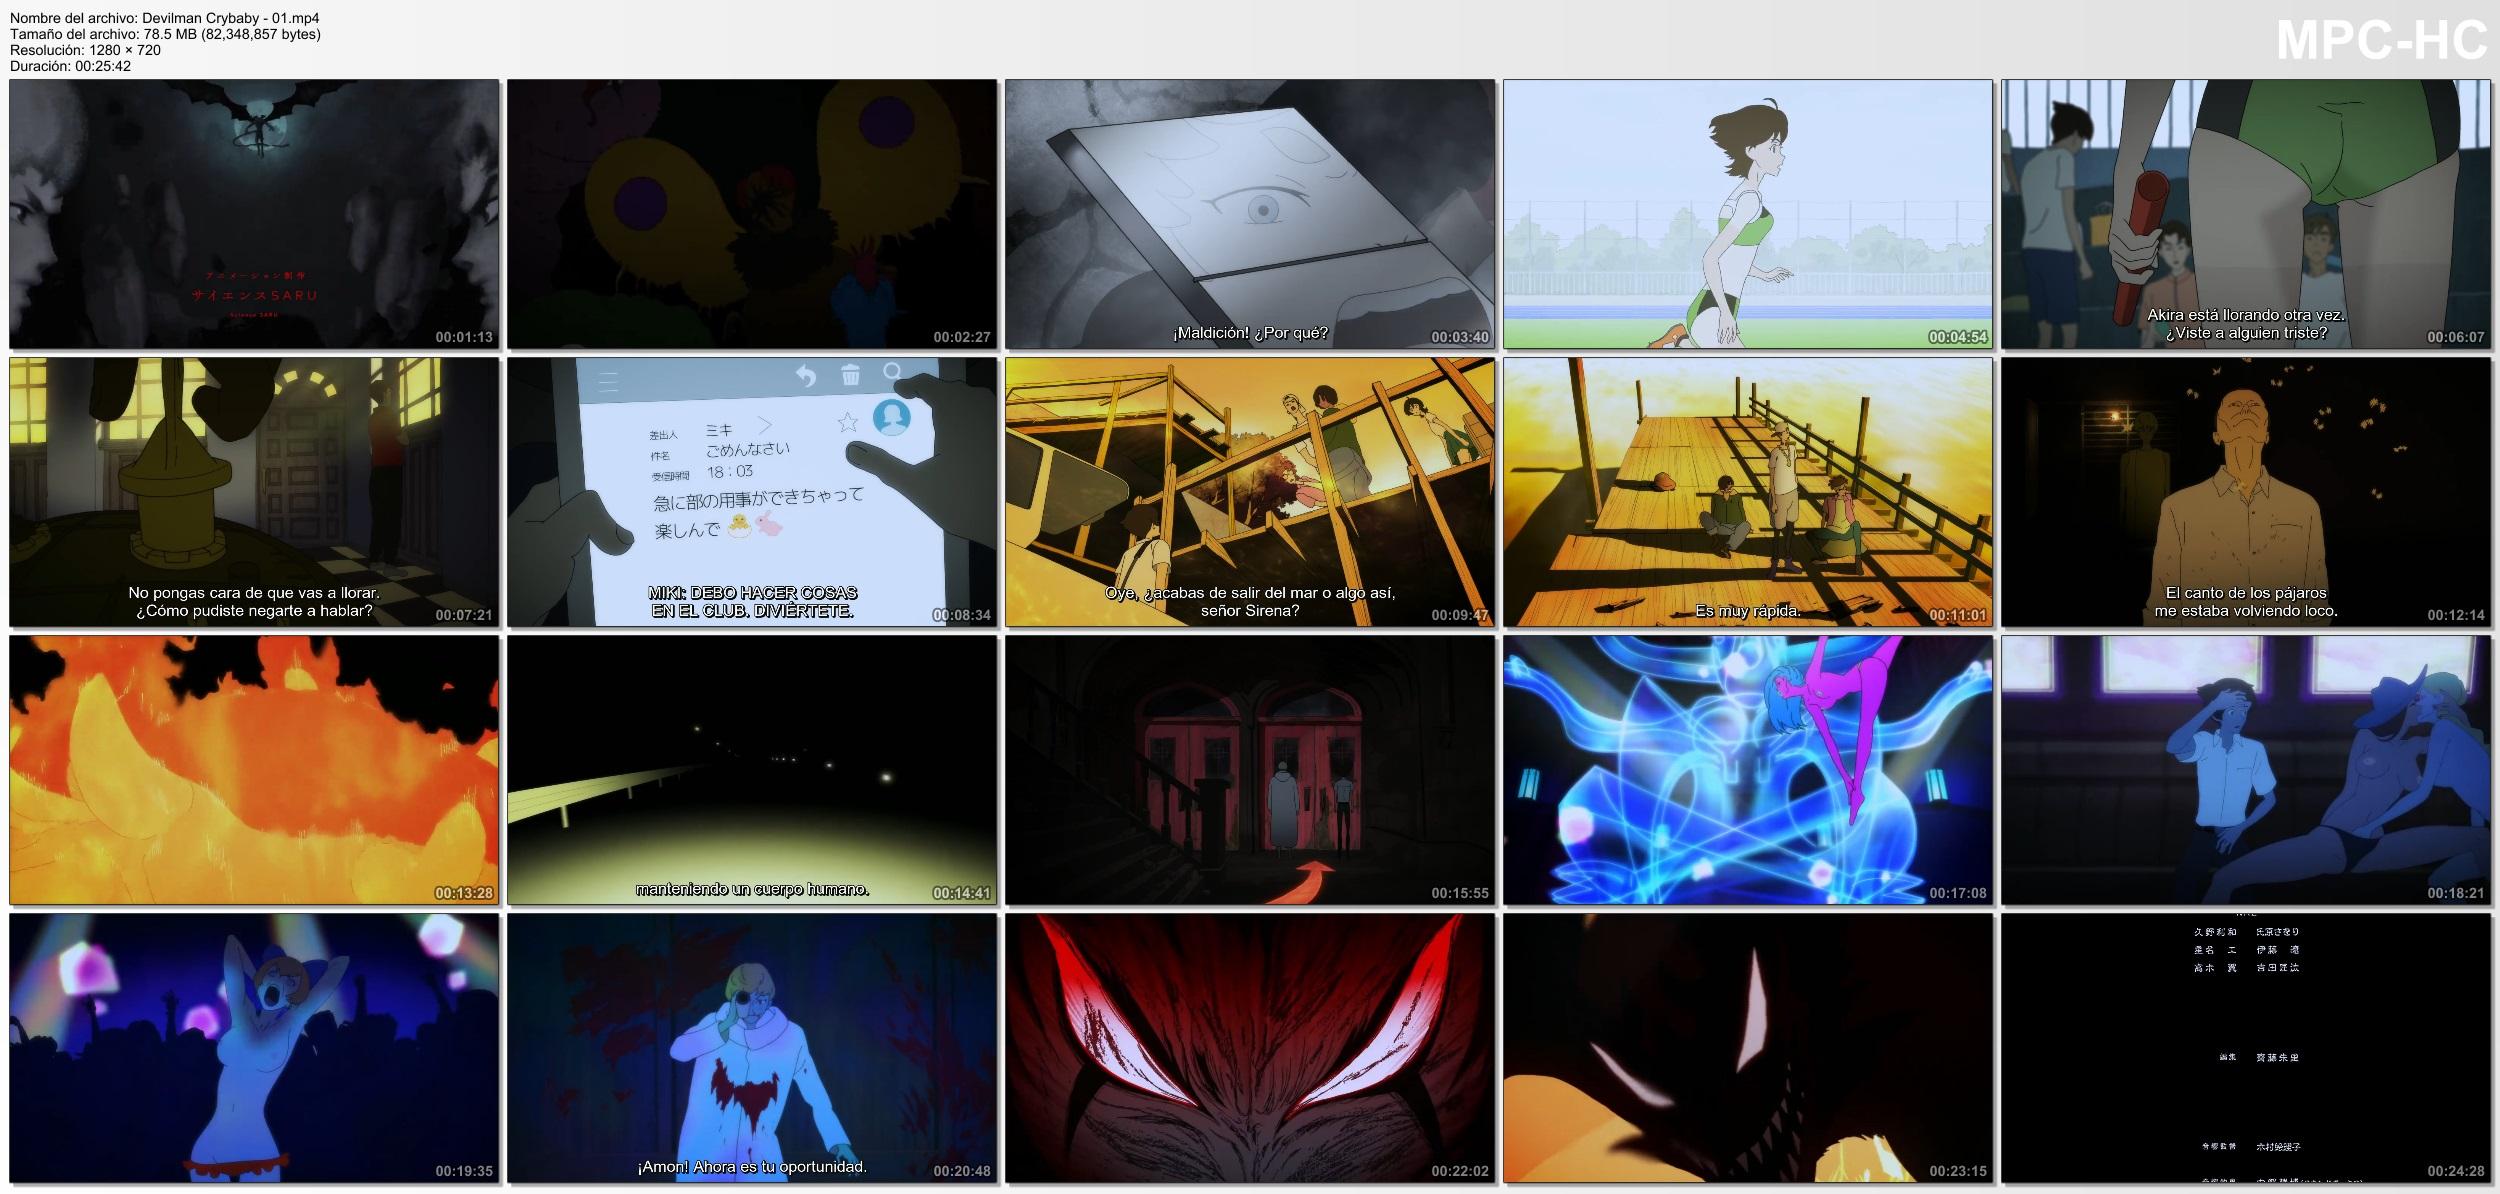 7azN5PLkNQpxW - [Aporte] DEVILMAN crybaby [10/10][Audio Lat-Jap][75MB][720P][MEGA][Completo] - Anime Ligero [Descargas]